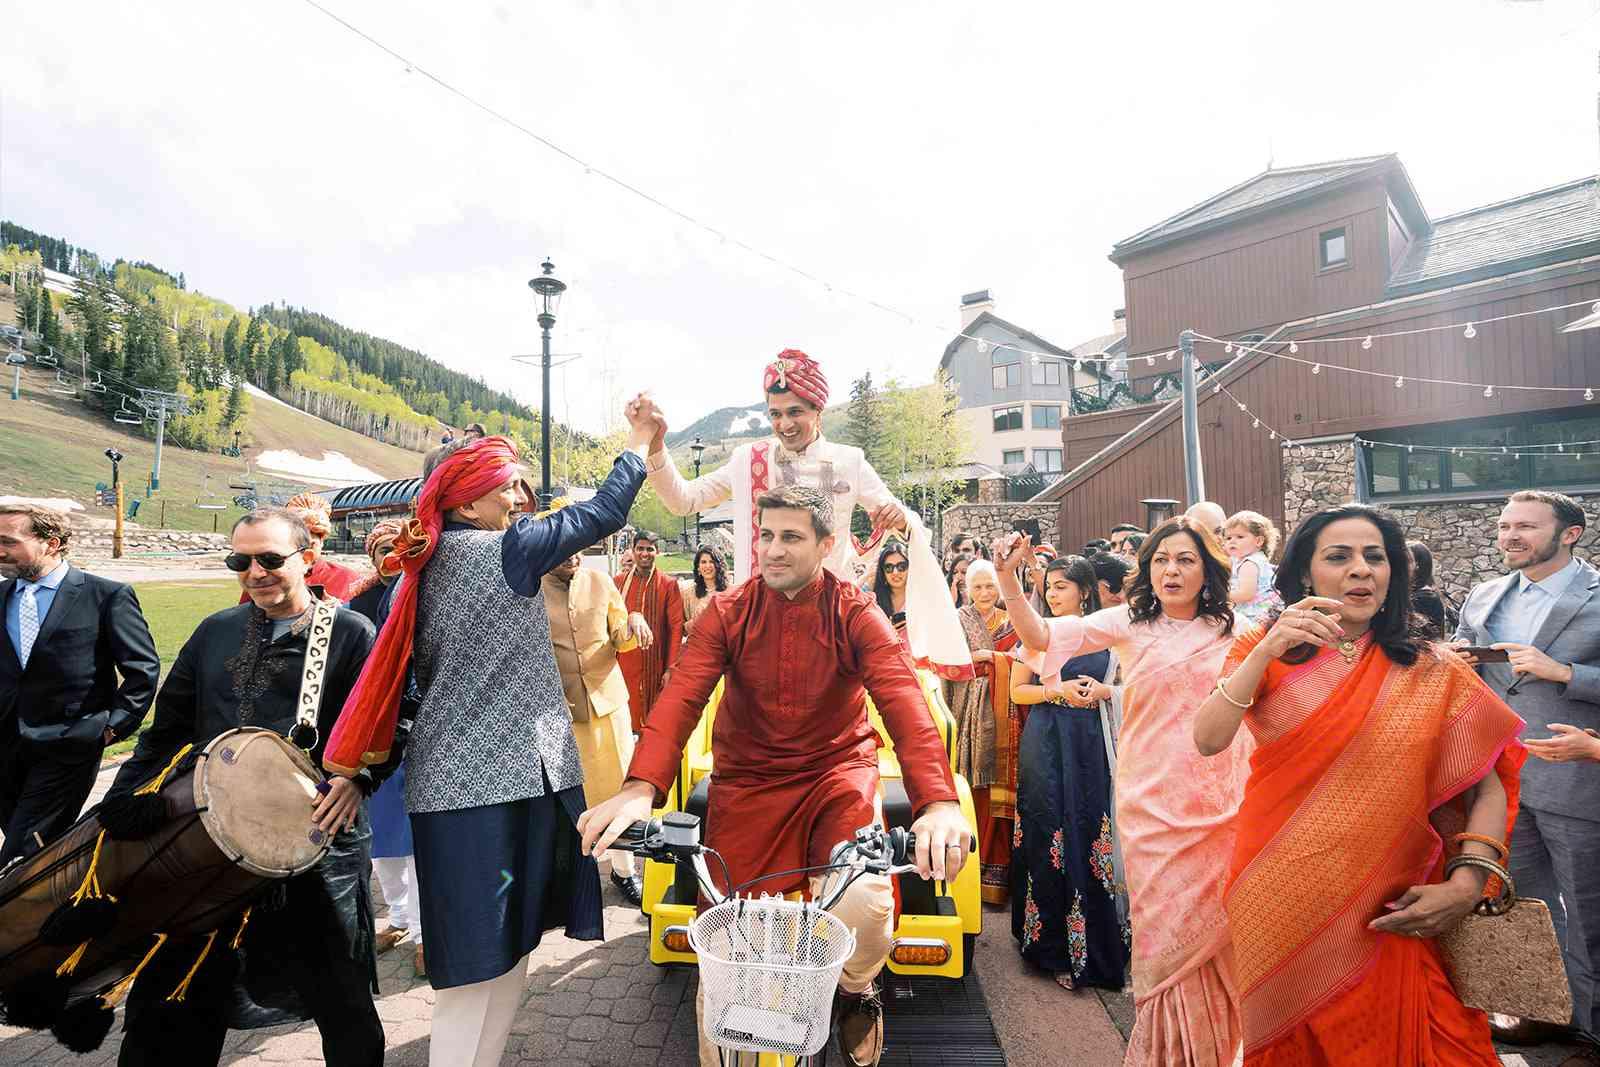 groom riding pedicab